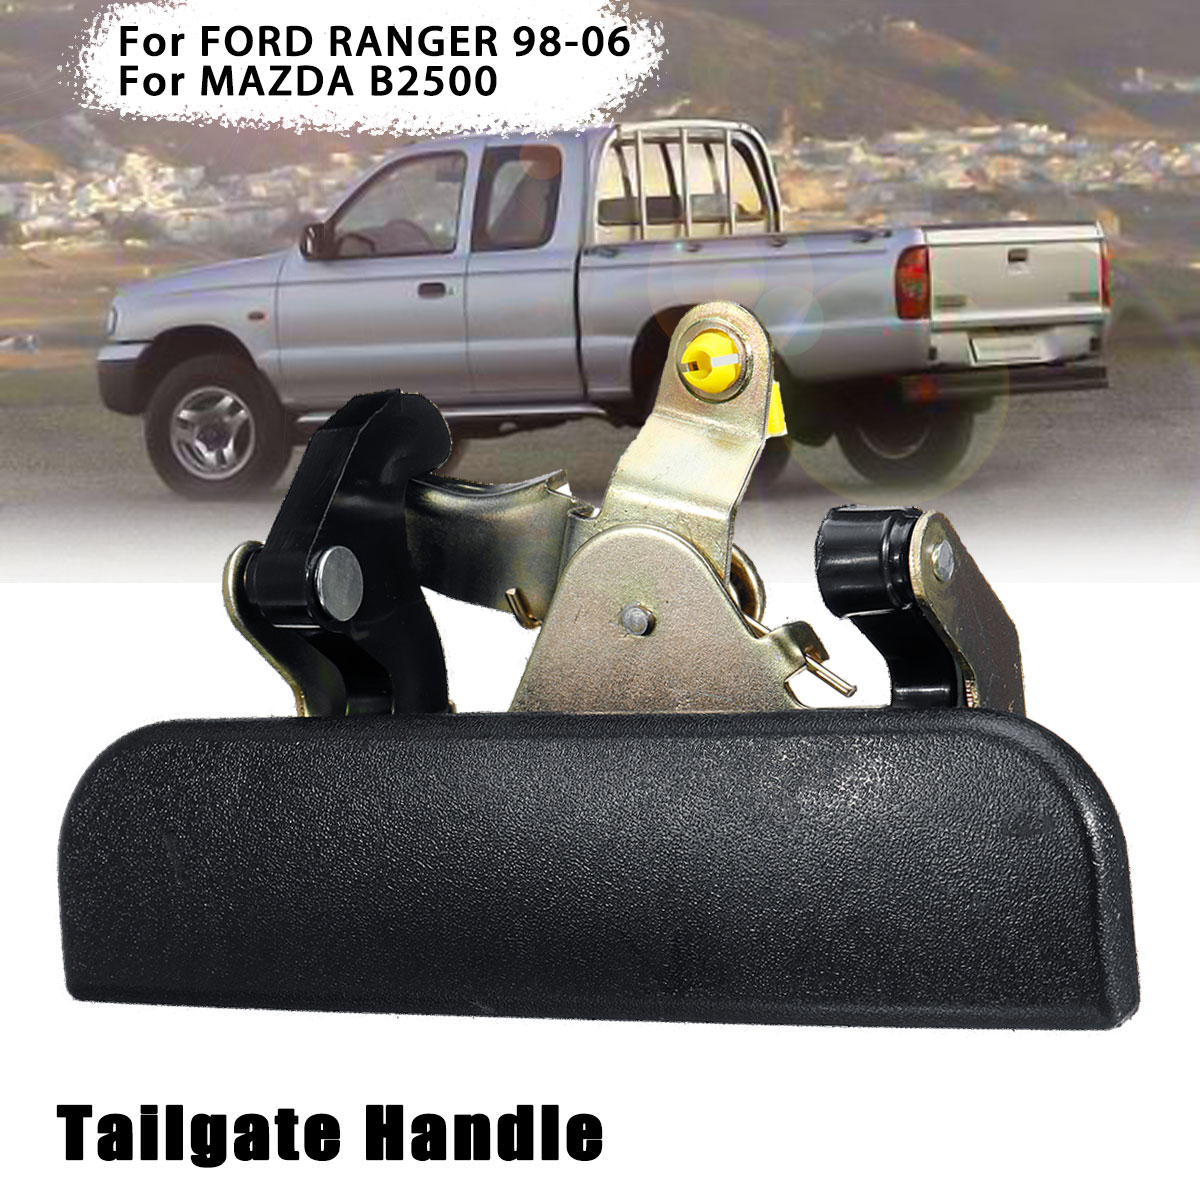 New Ignition Lock Starter Switch Ford Ranger 2002-2012 Mazda B2500 Pickup BT-50